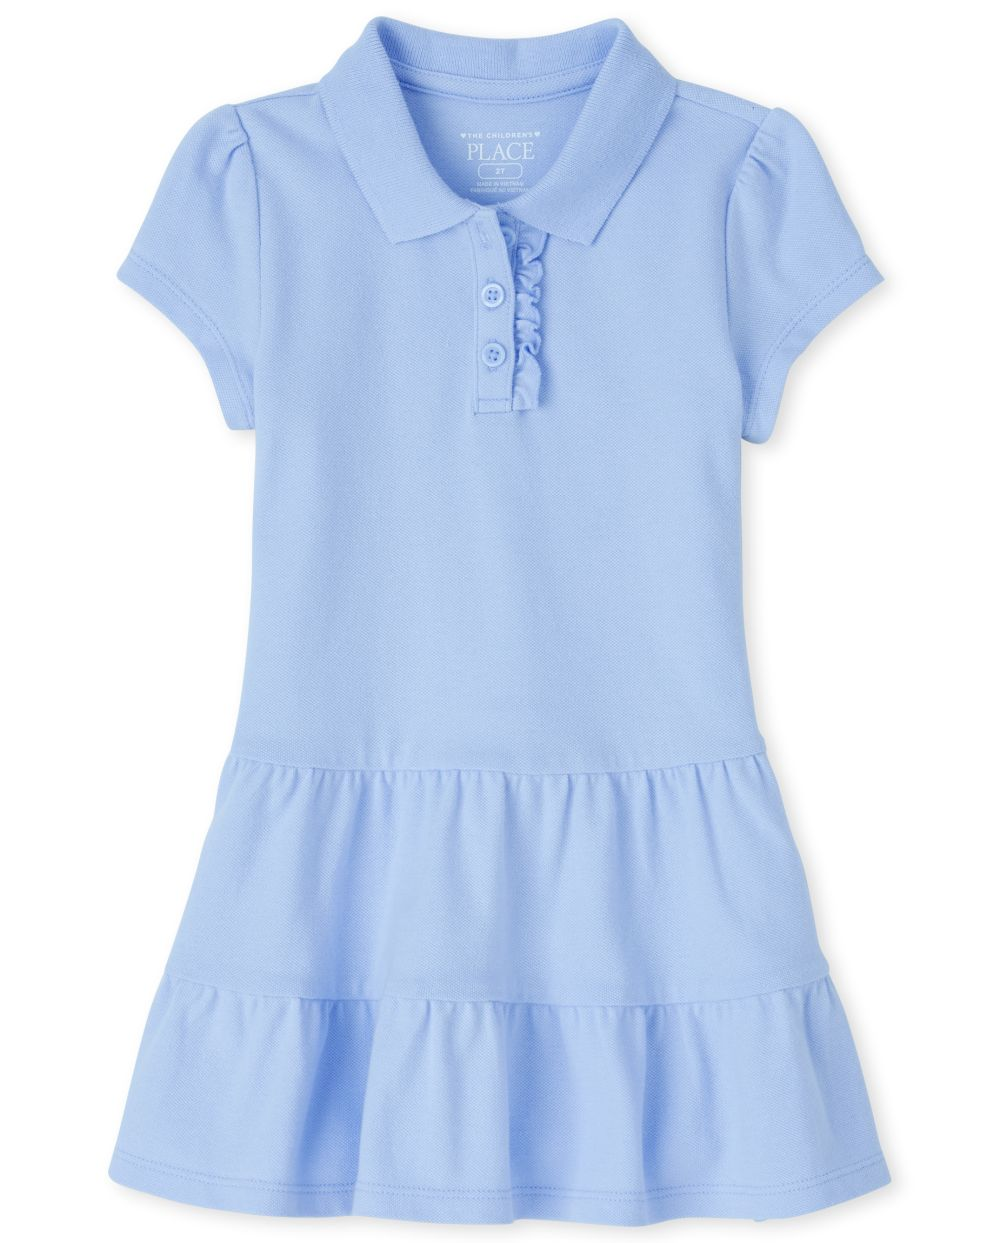 Vestido estilo polo de piqué escalonado con uniforme para niñas pequeñas